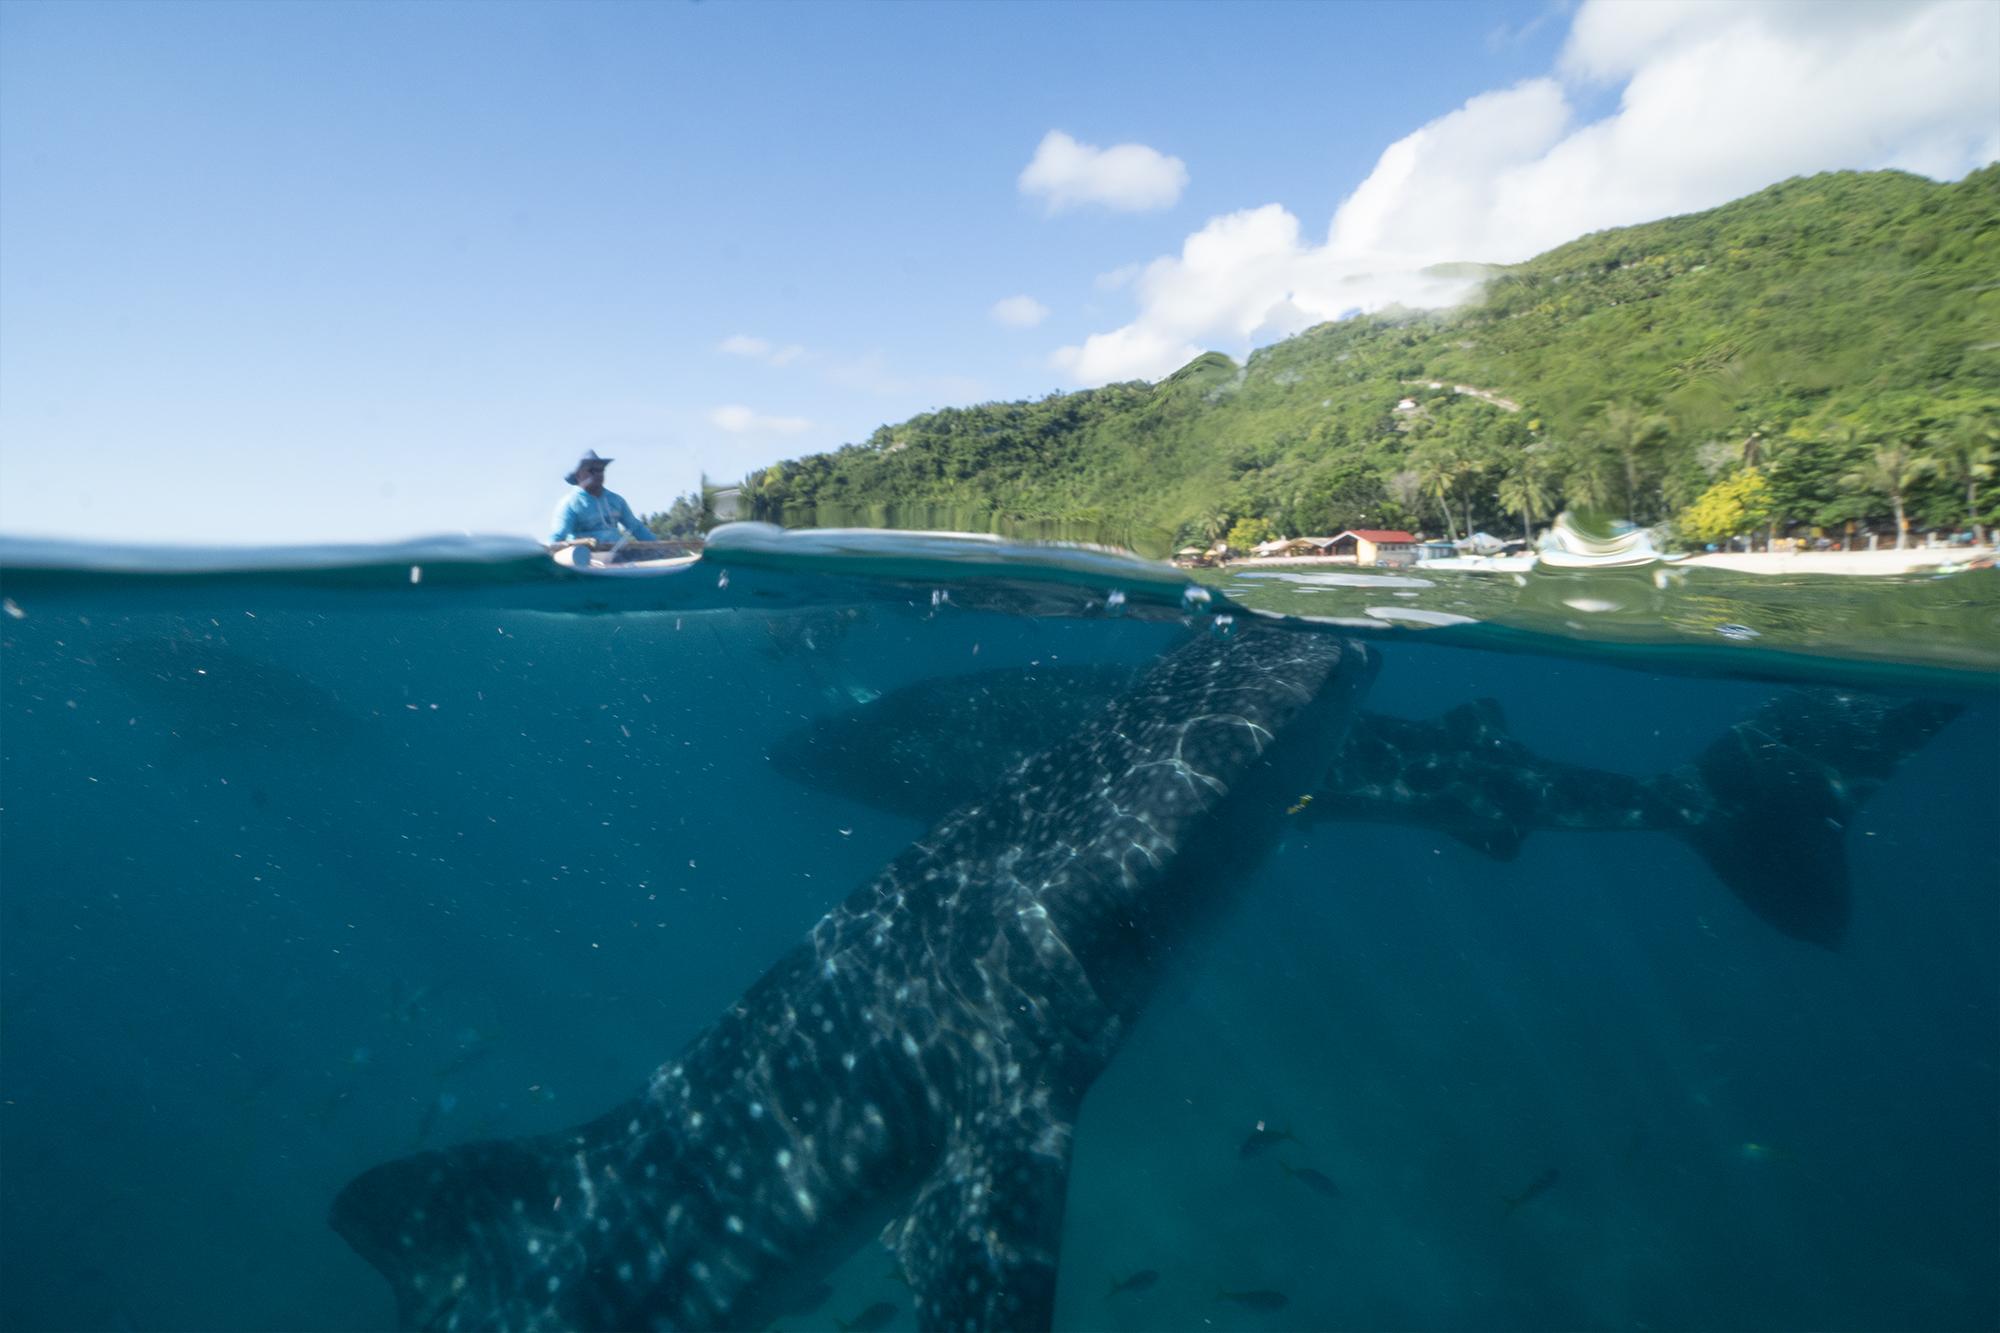 WhaleShark-Cebu-Oslob-hobo-life-hoang